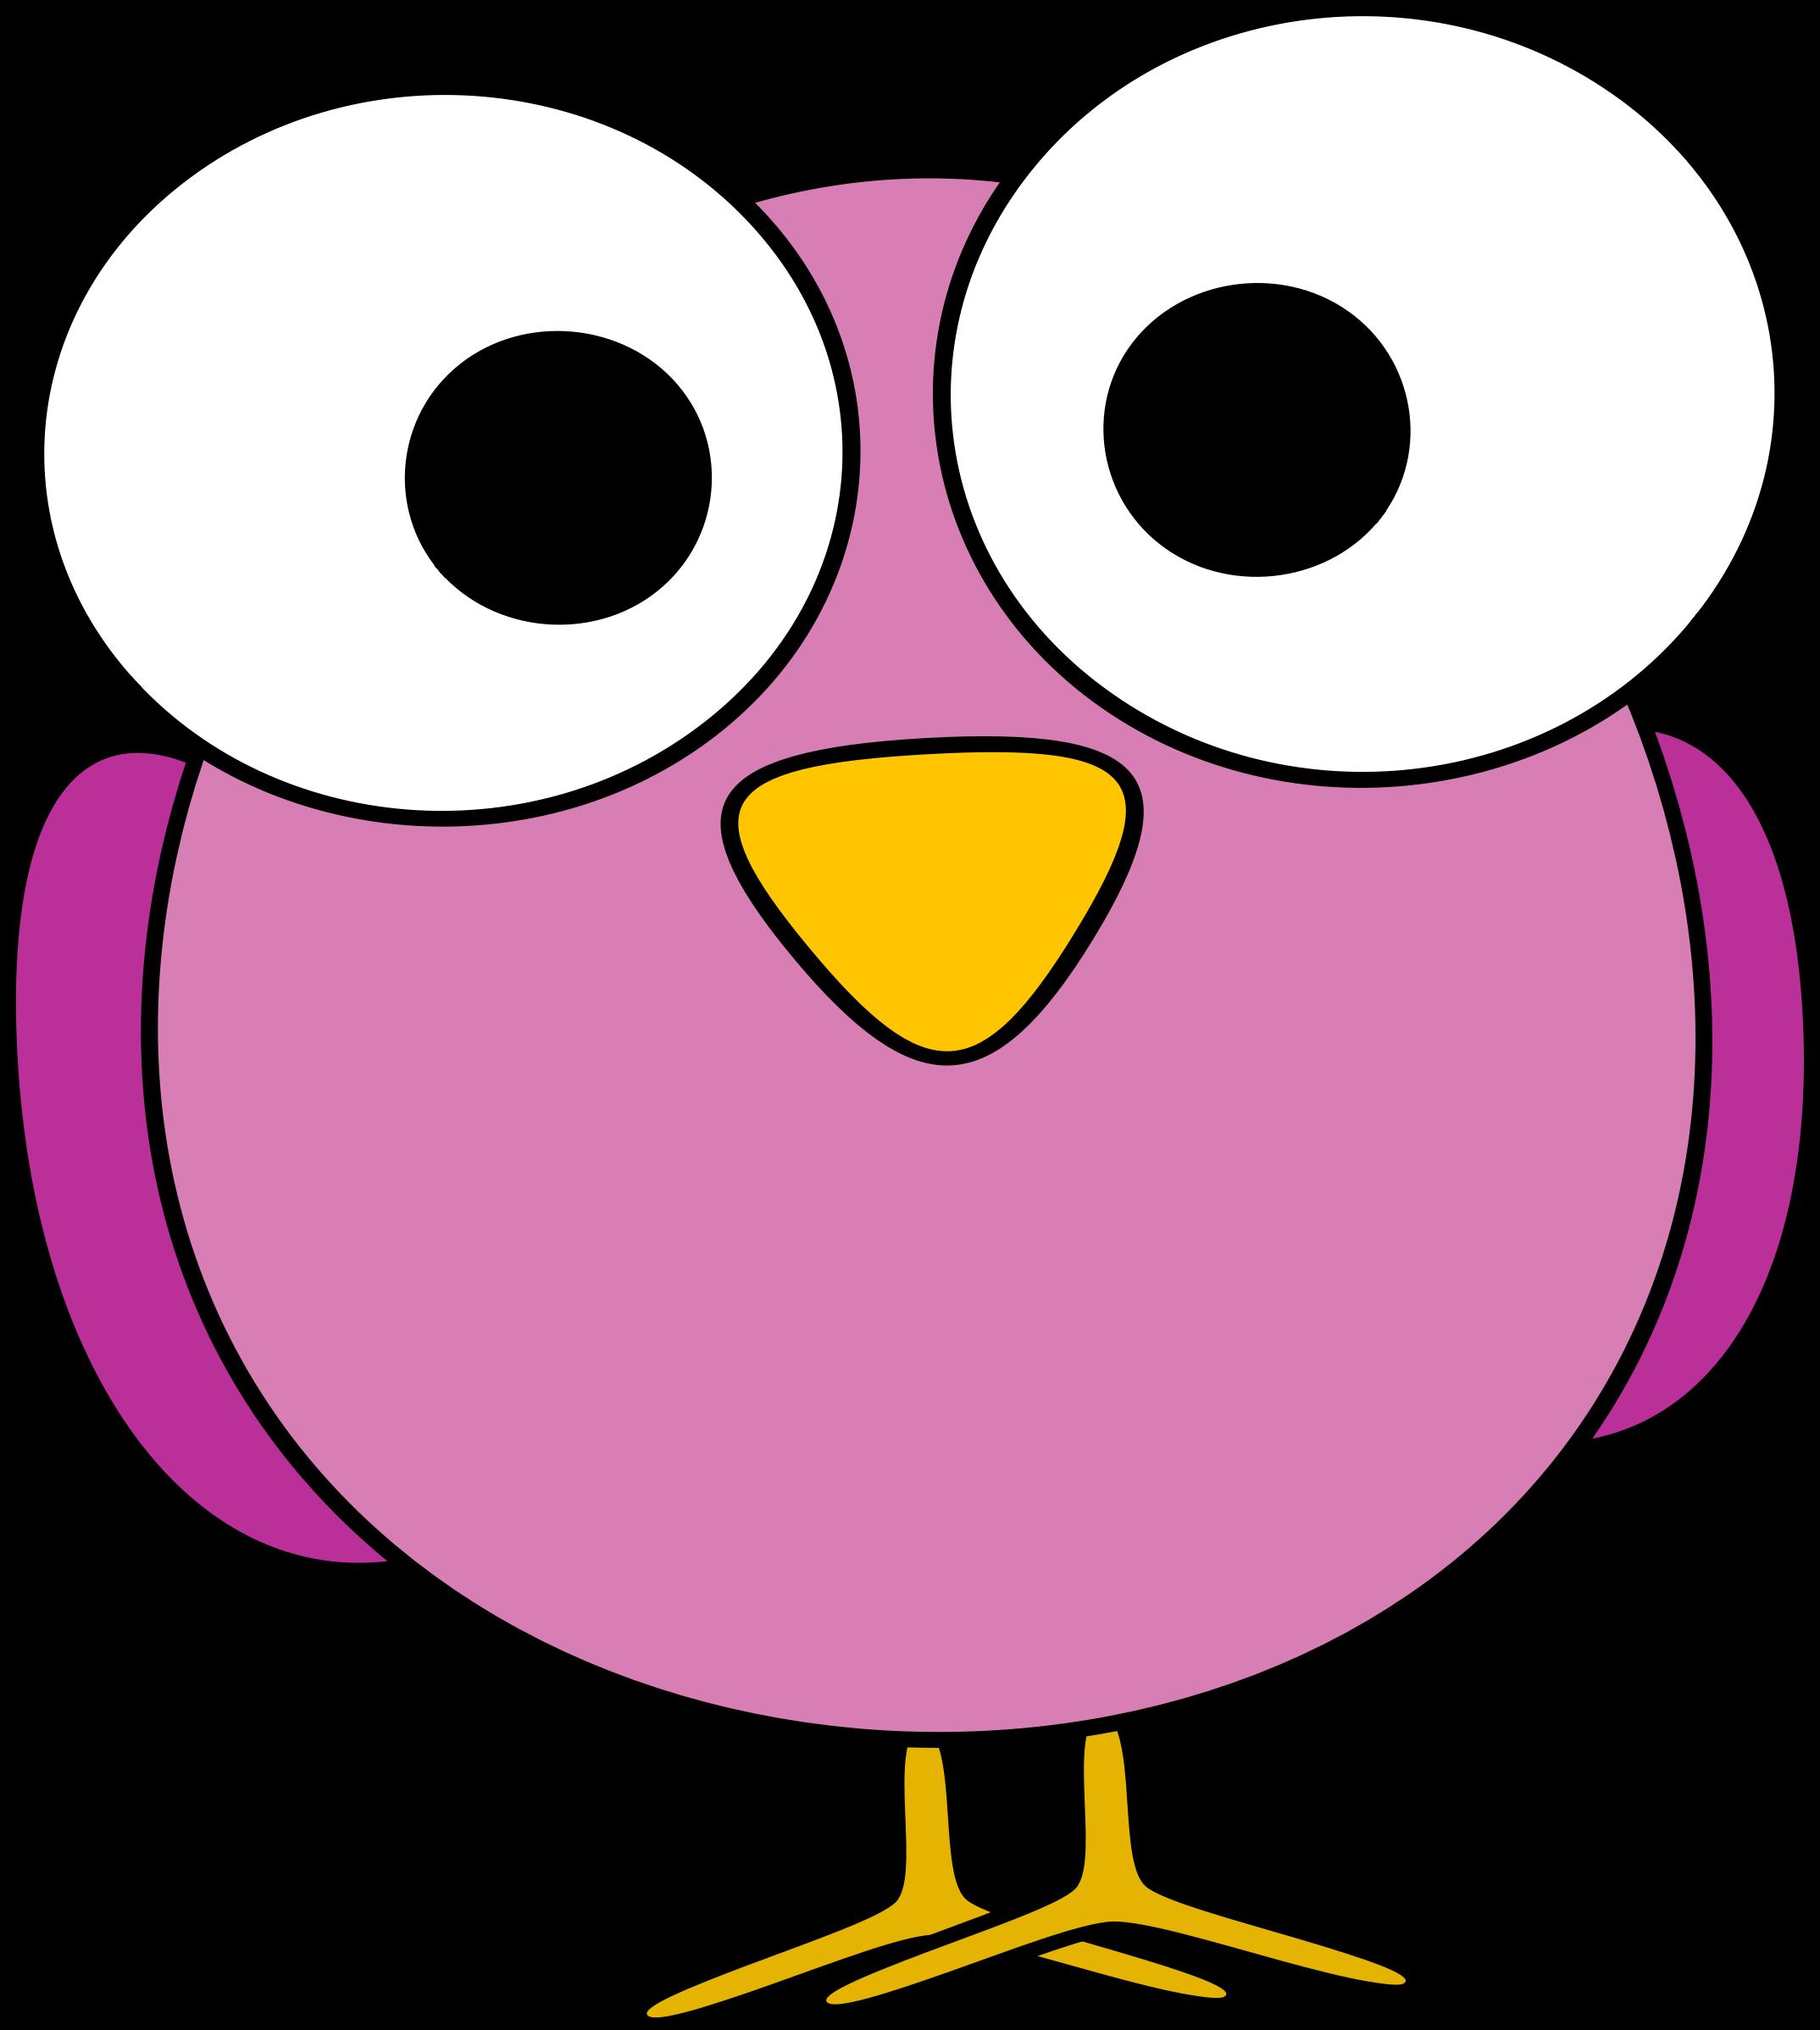 2148x2396 Cute Eye Cliparts Free Download Clip Art Free Clip Art